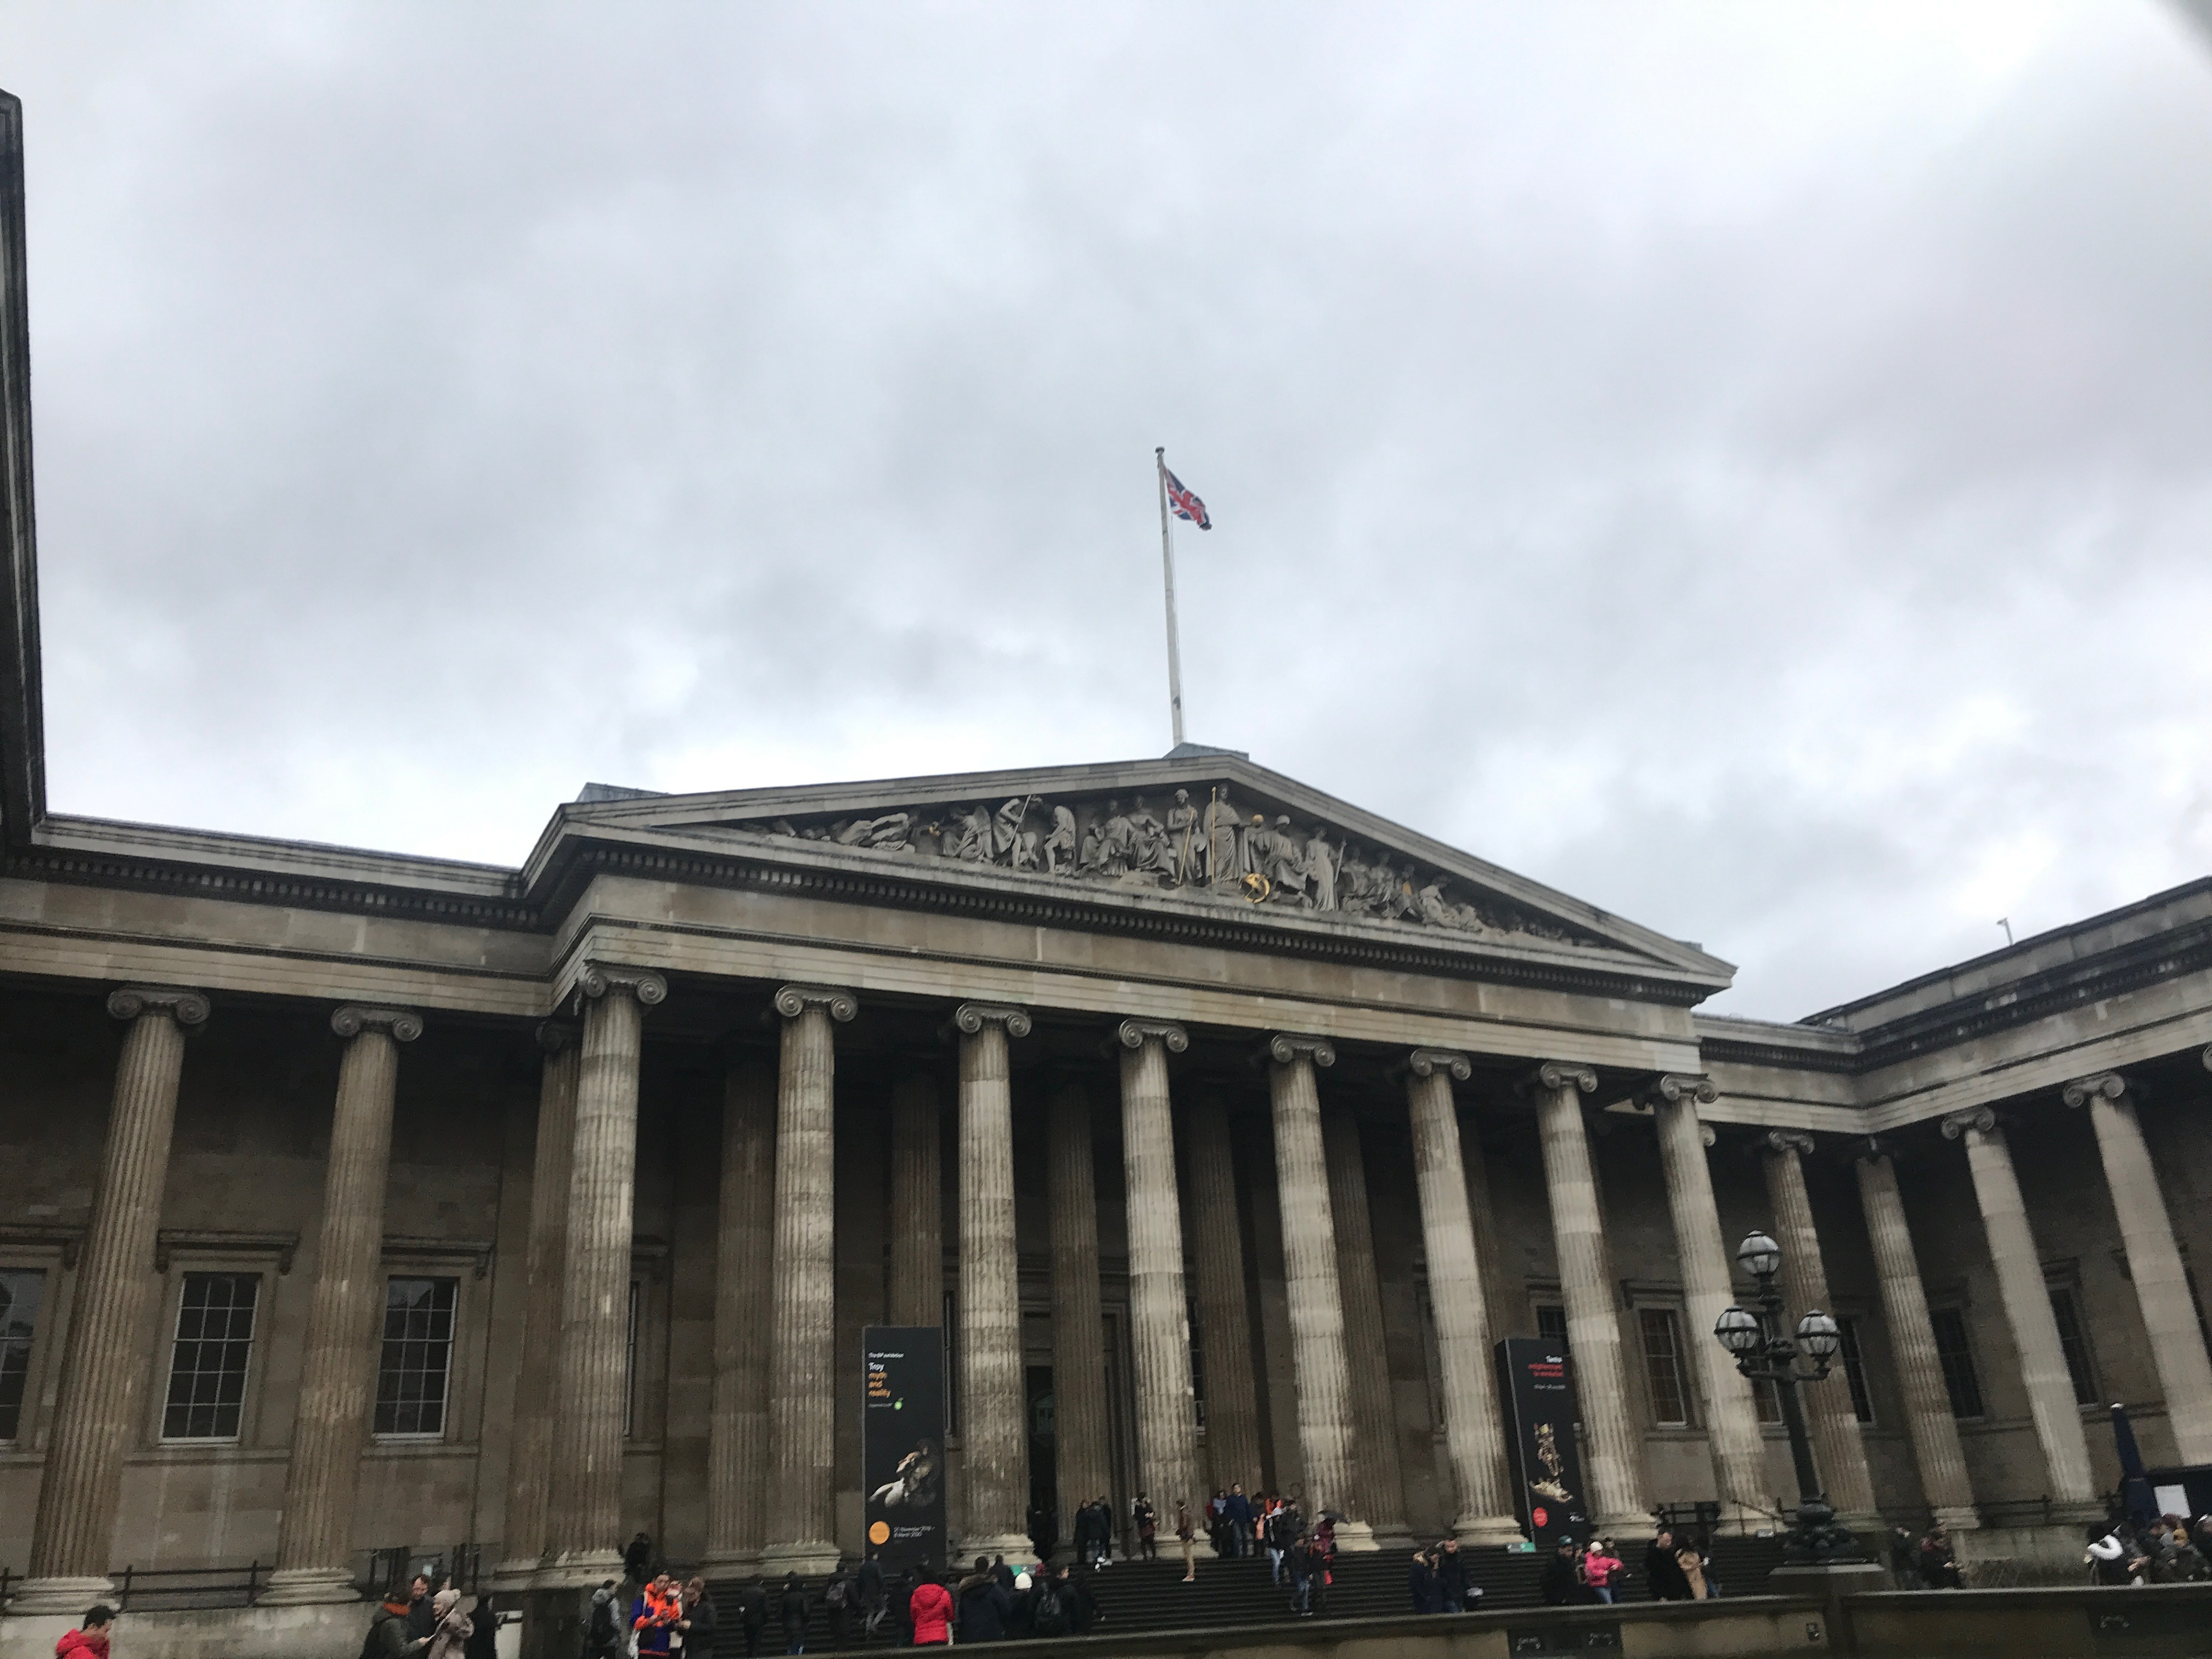 London (Day 3)